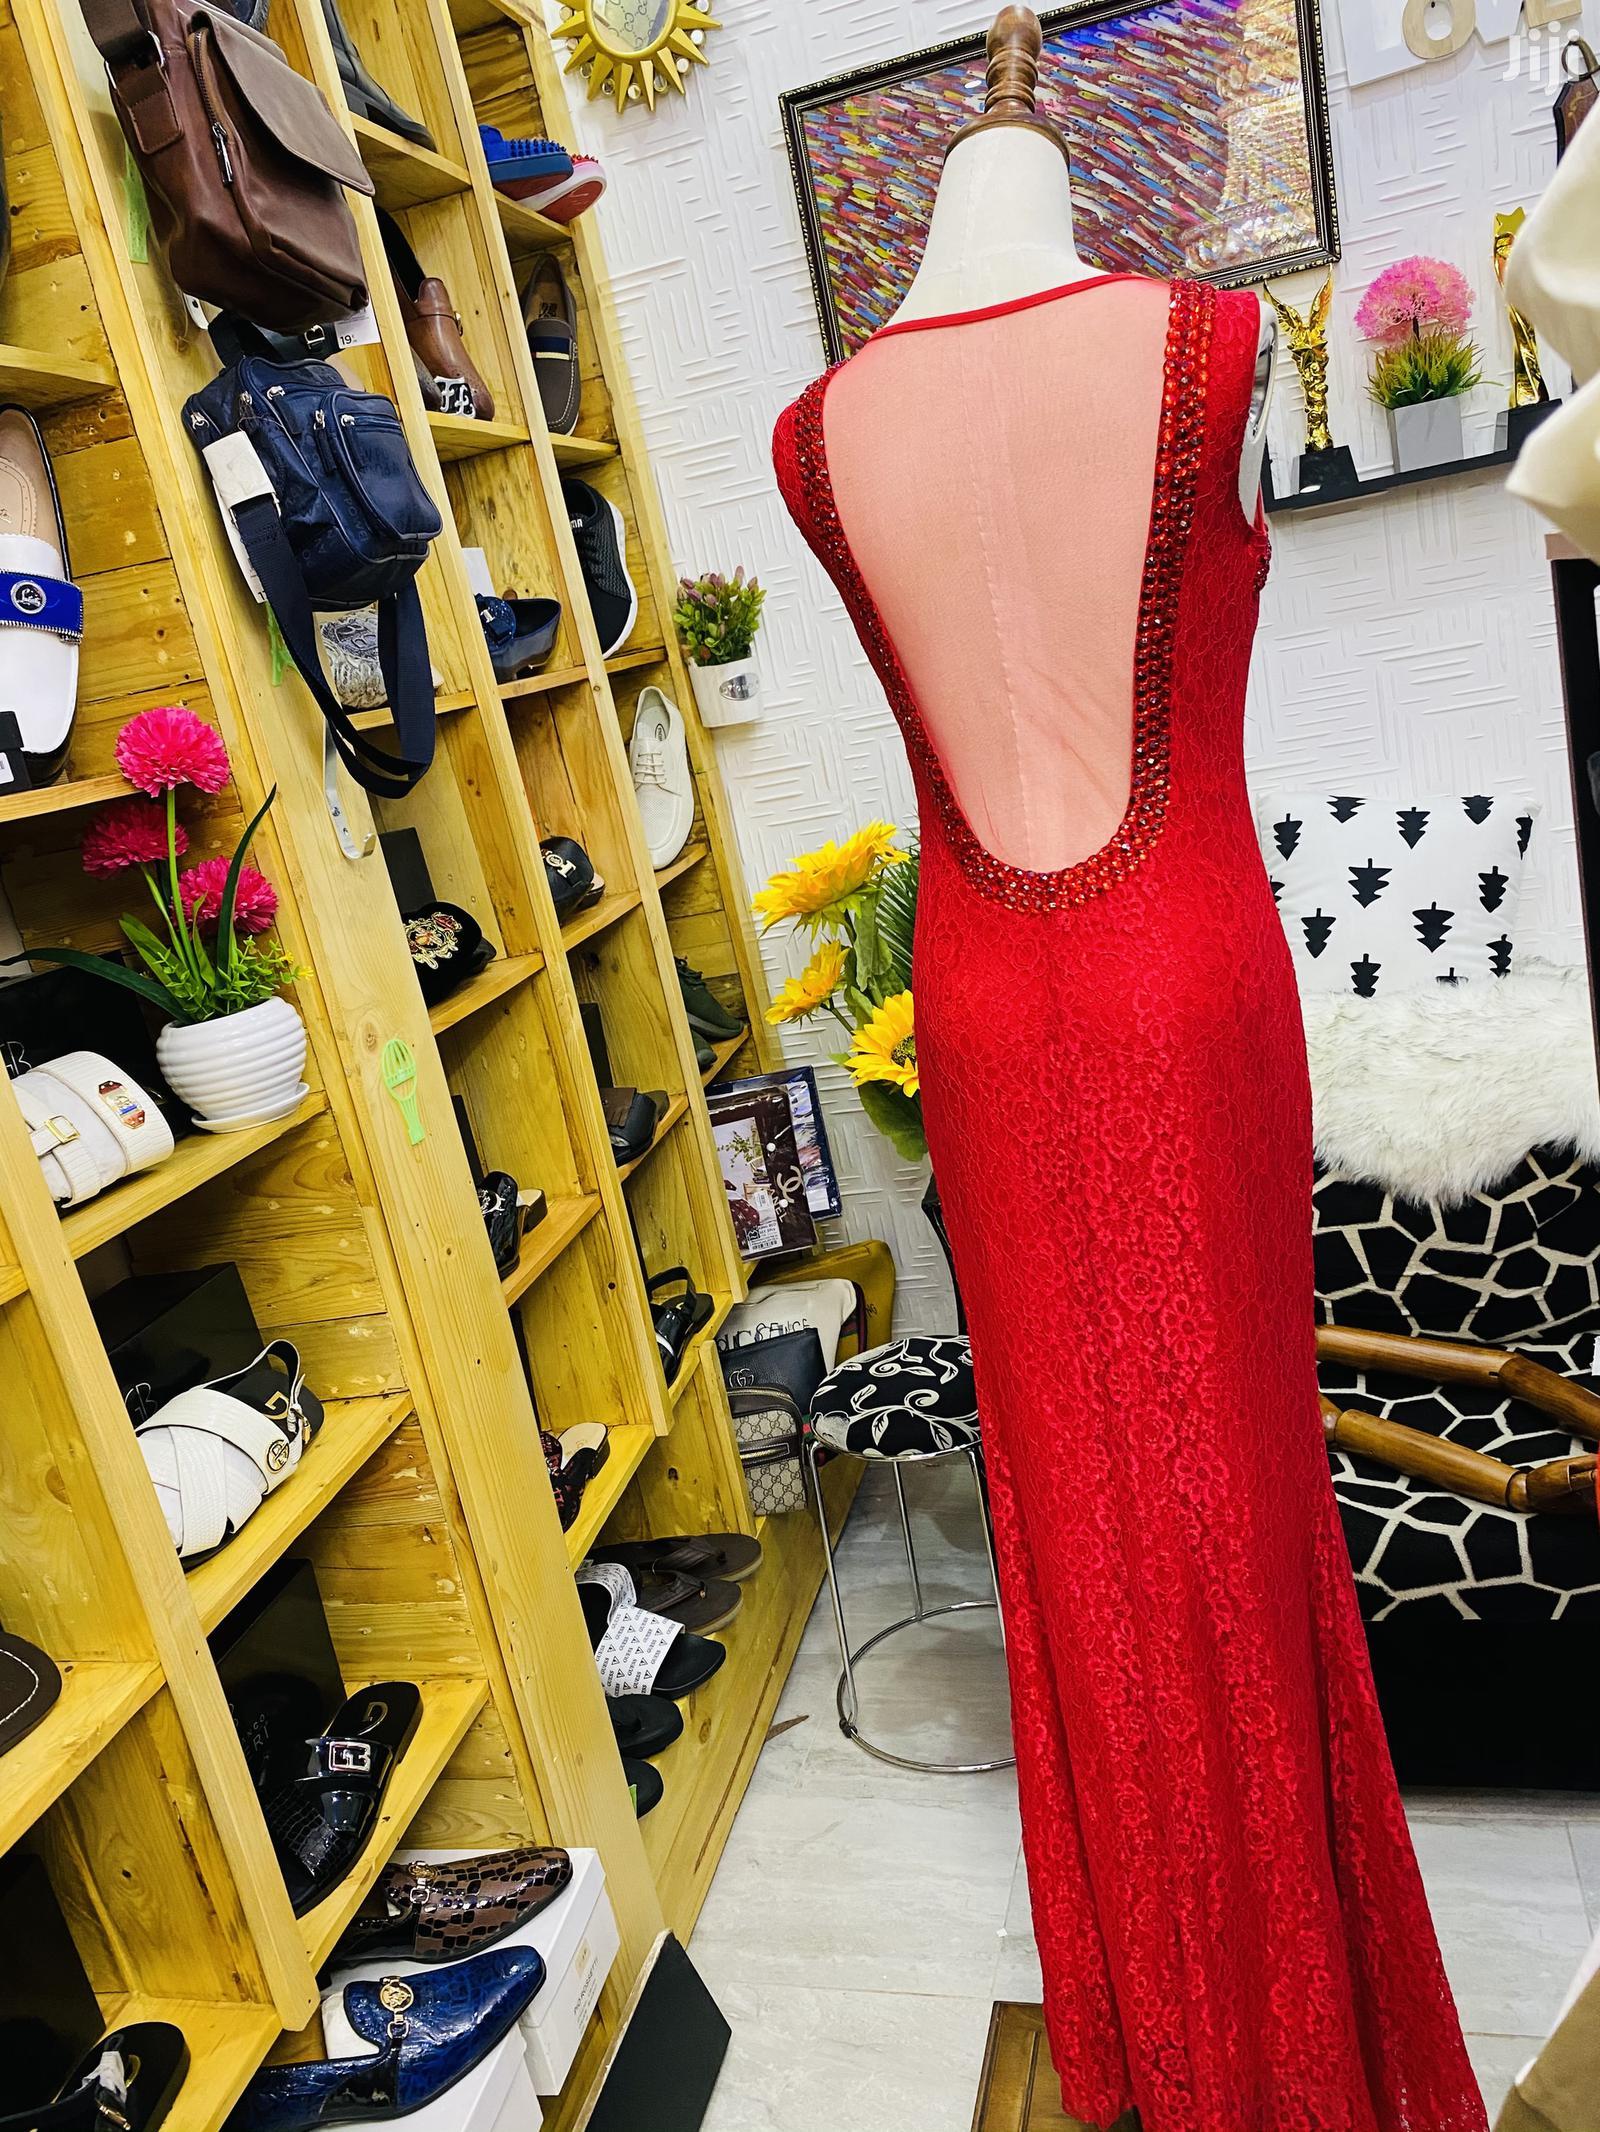 Long Dress Dinner Wedding Dress | Wedding Wear & Accessories for sale in East Legon, Greater Accra, Ghana